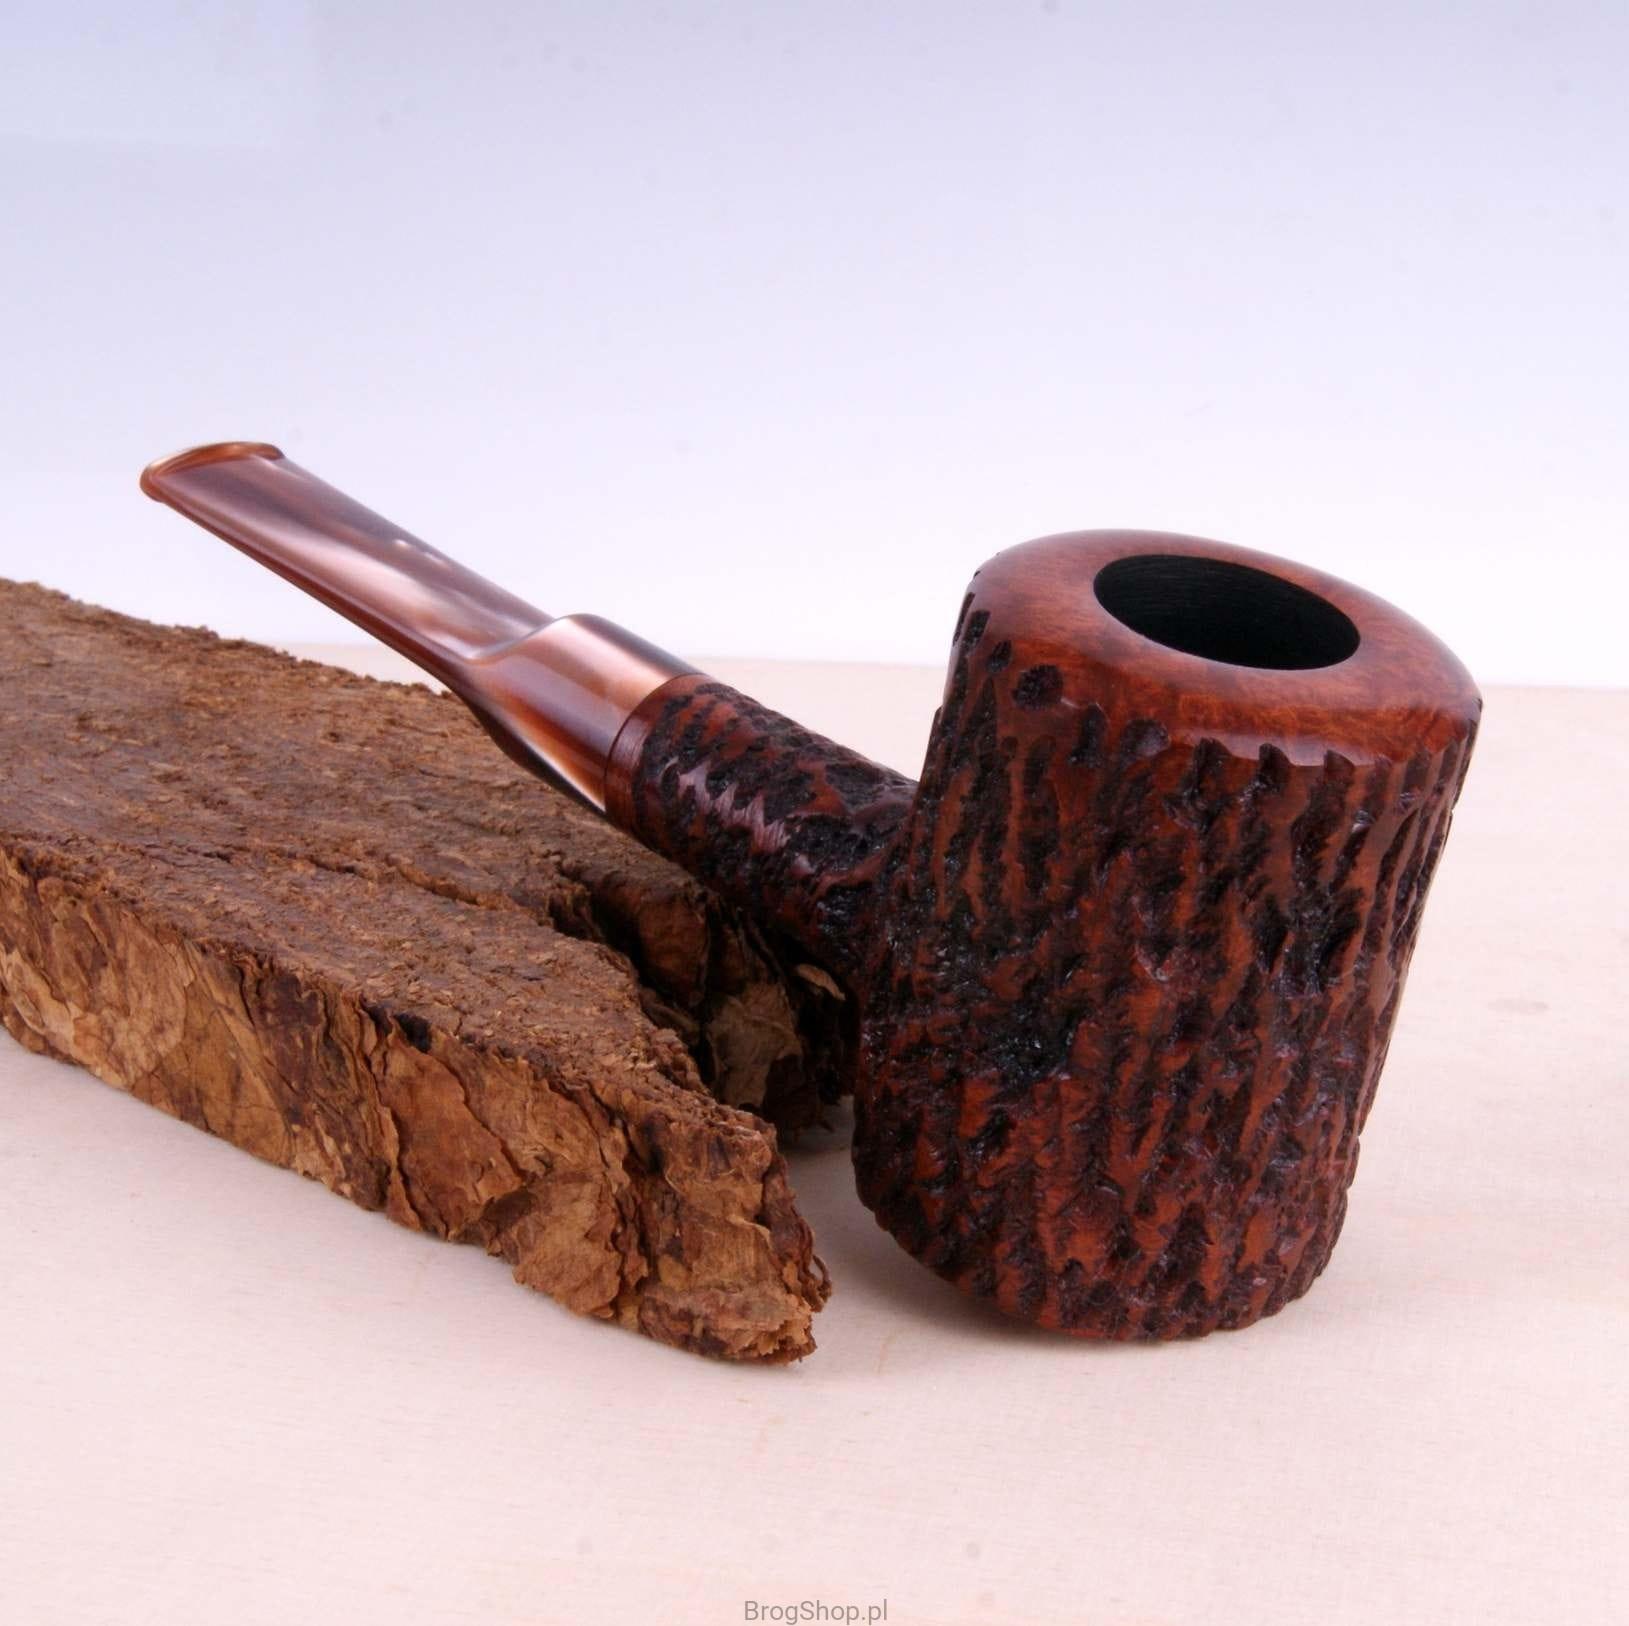 Pipe no 107 Aged 9 mm Mr Brog Briar